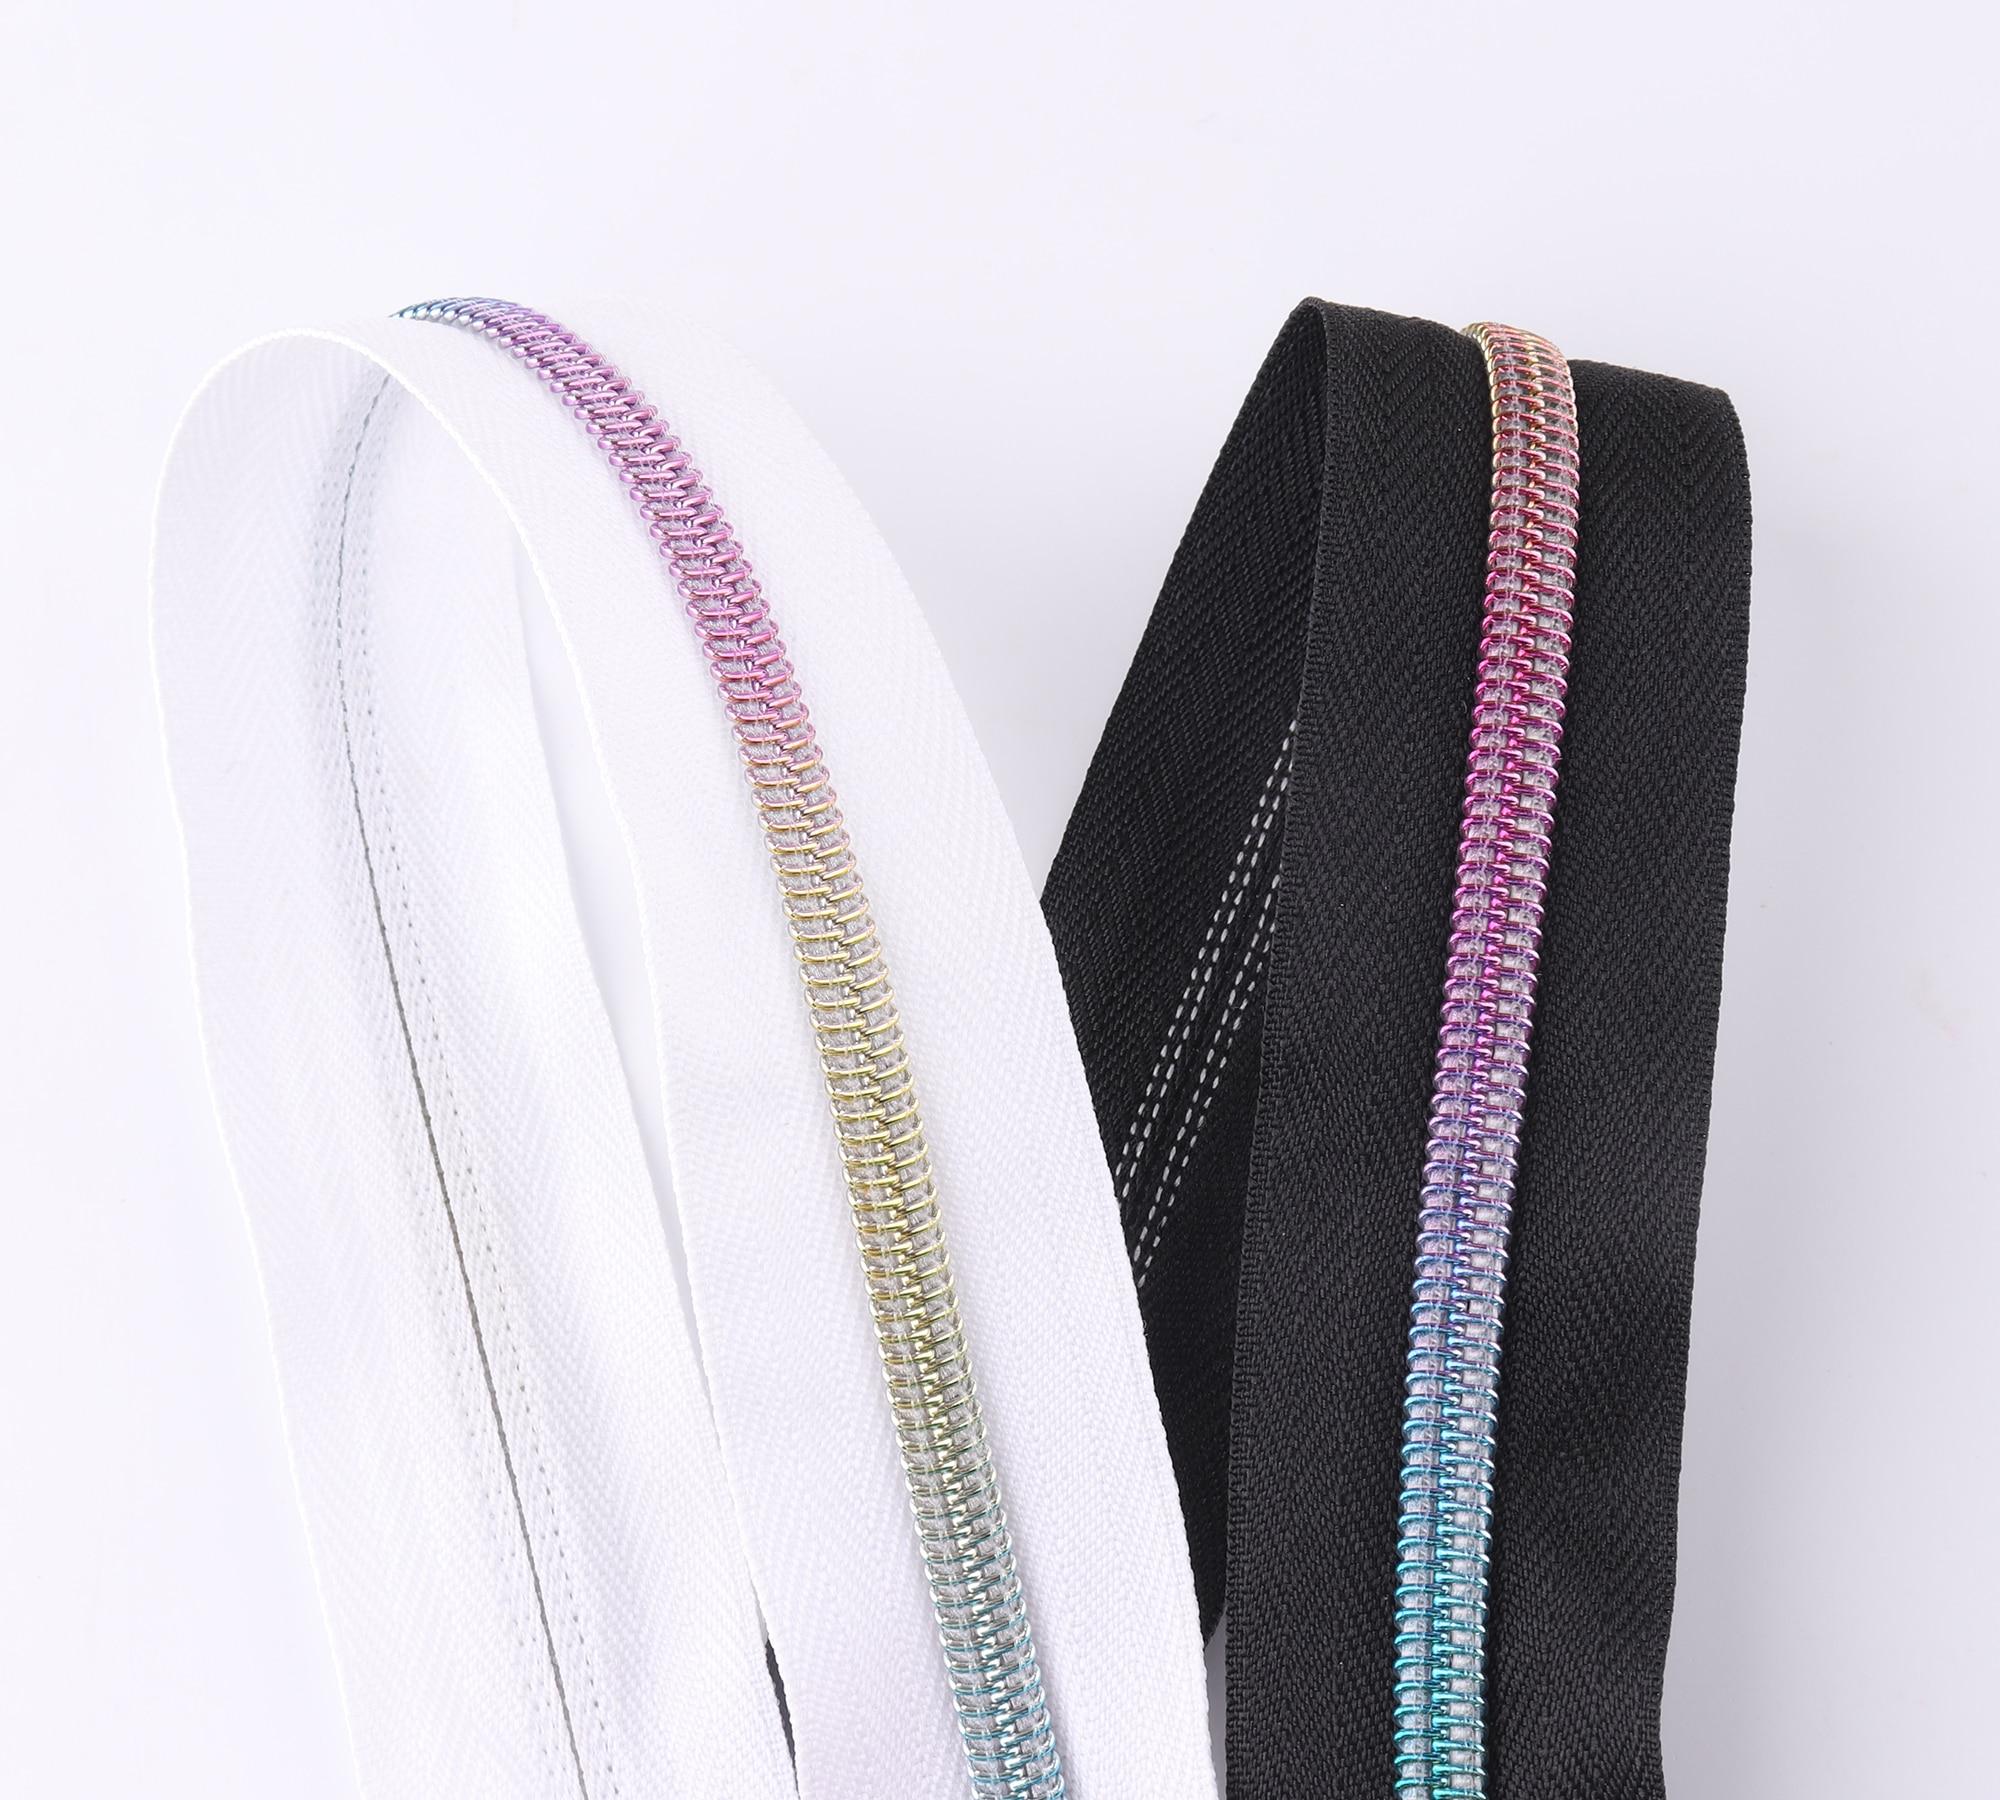 5 Meter Geen 5 # Regenboog Rits Tape Lederen Rits Nylon Tape Zip Ritsen Maat Diy Universele Rits vervanging Kit